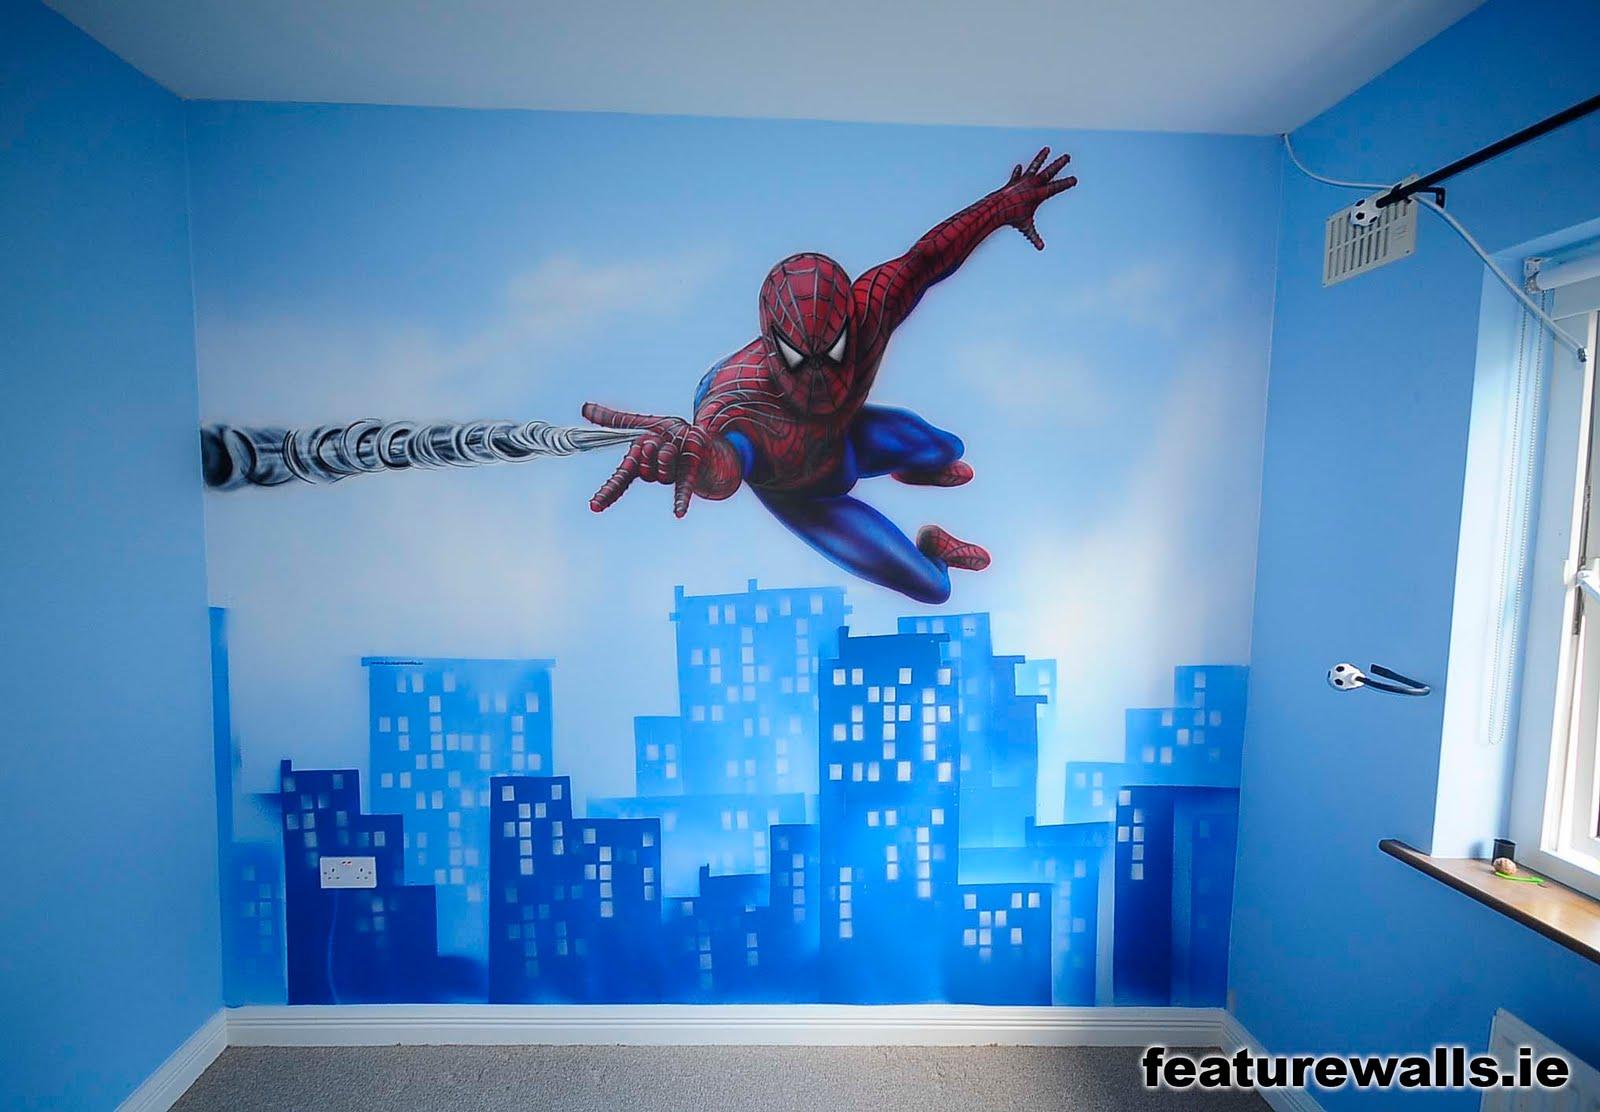 Wallpress 1080p Hd Desktop Kids Bedroom Painting Ideas